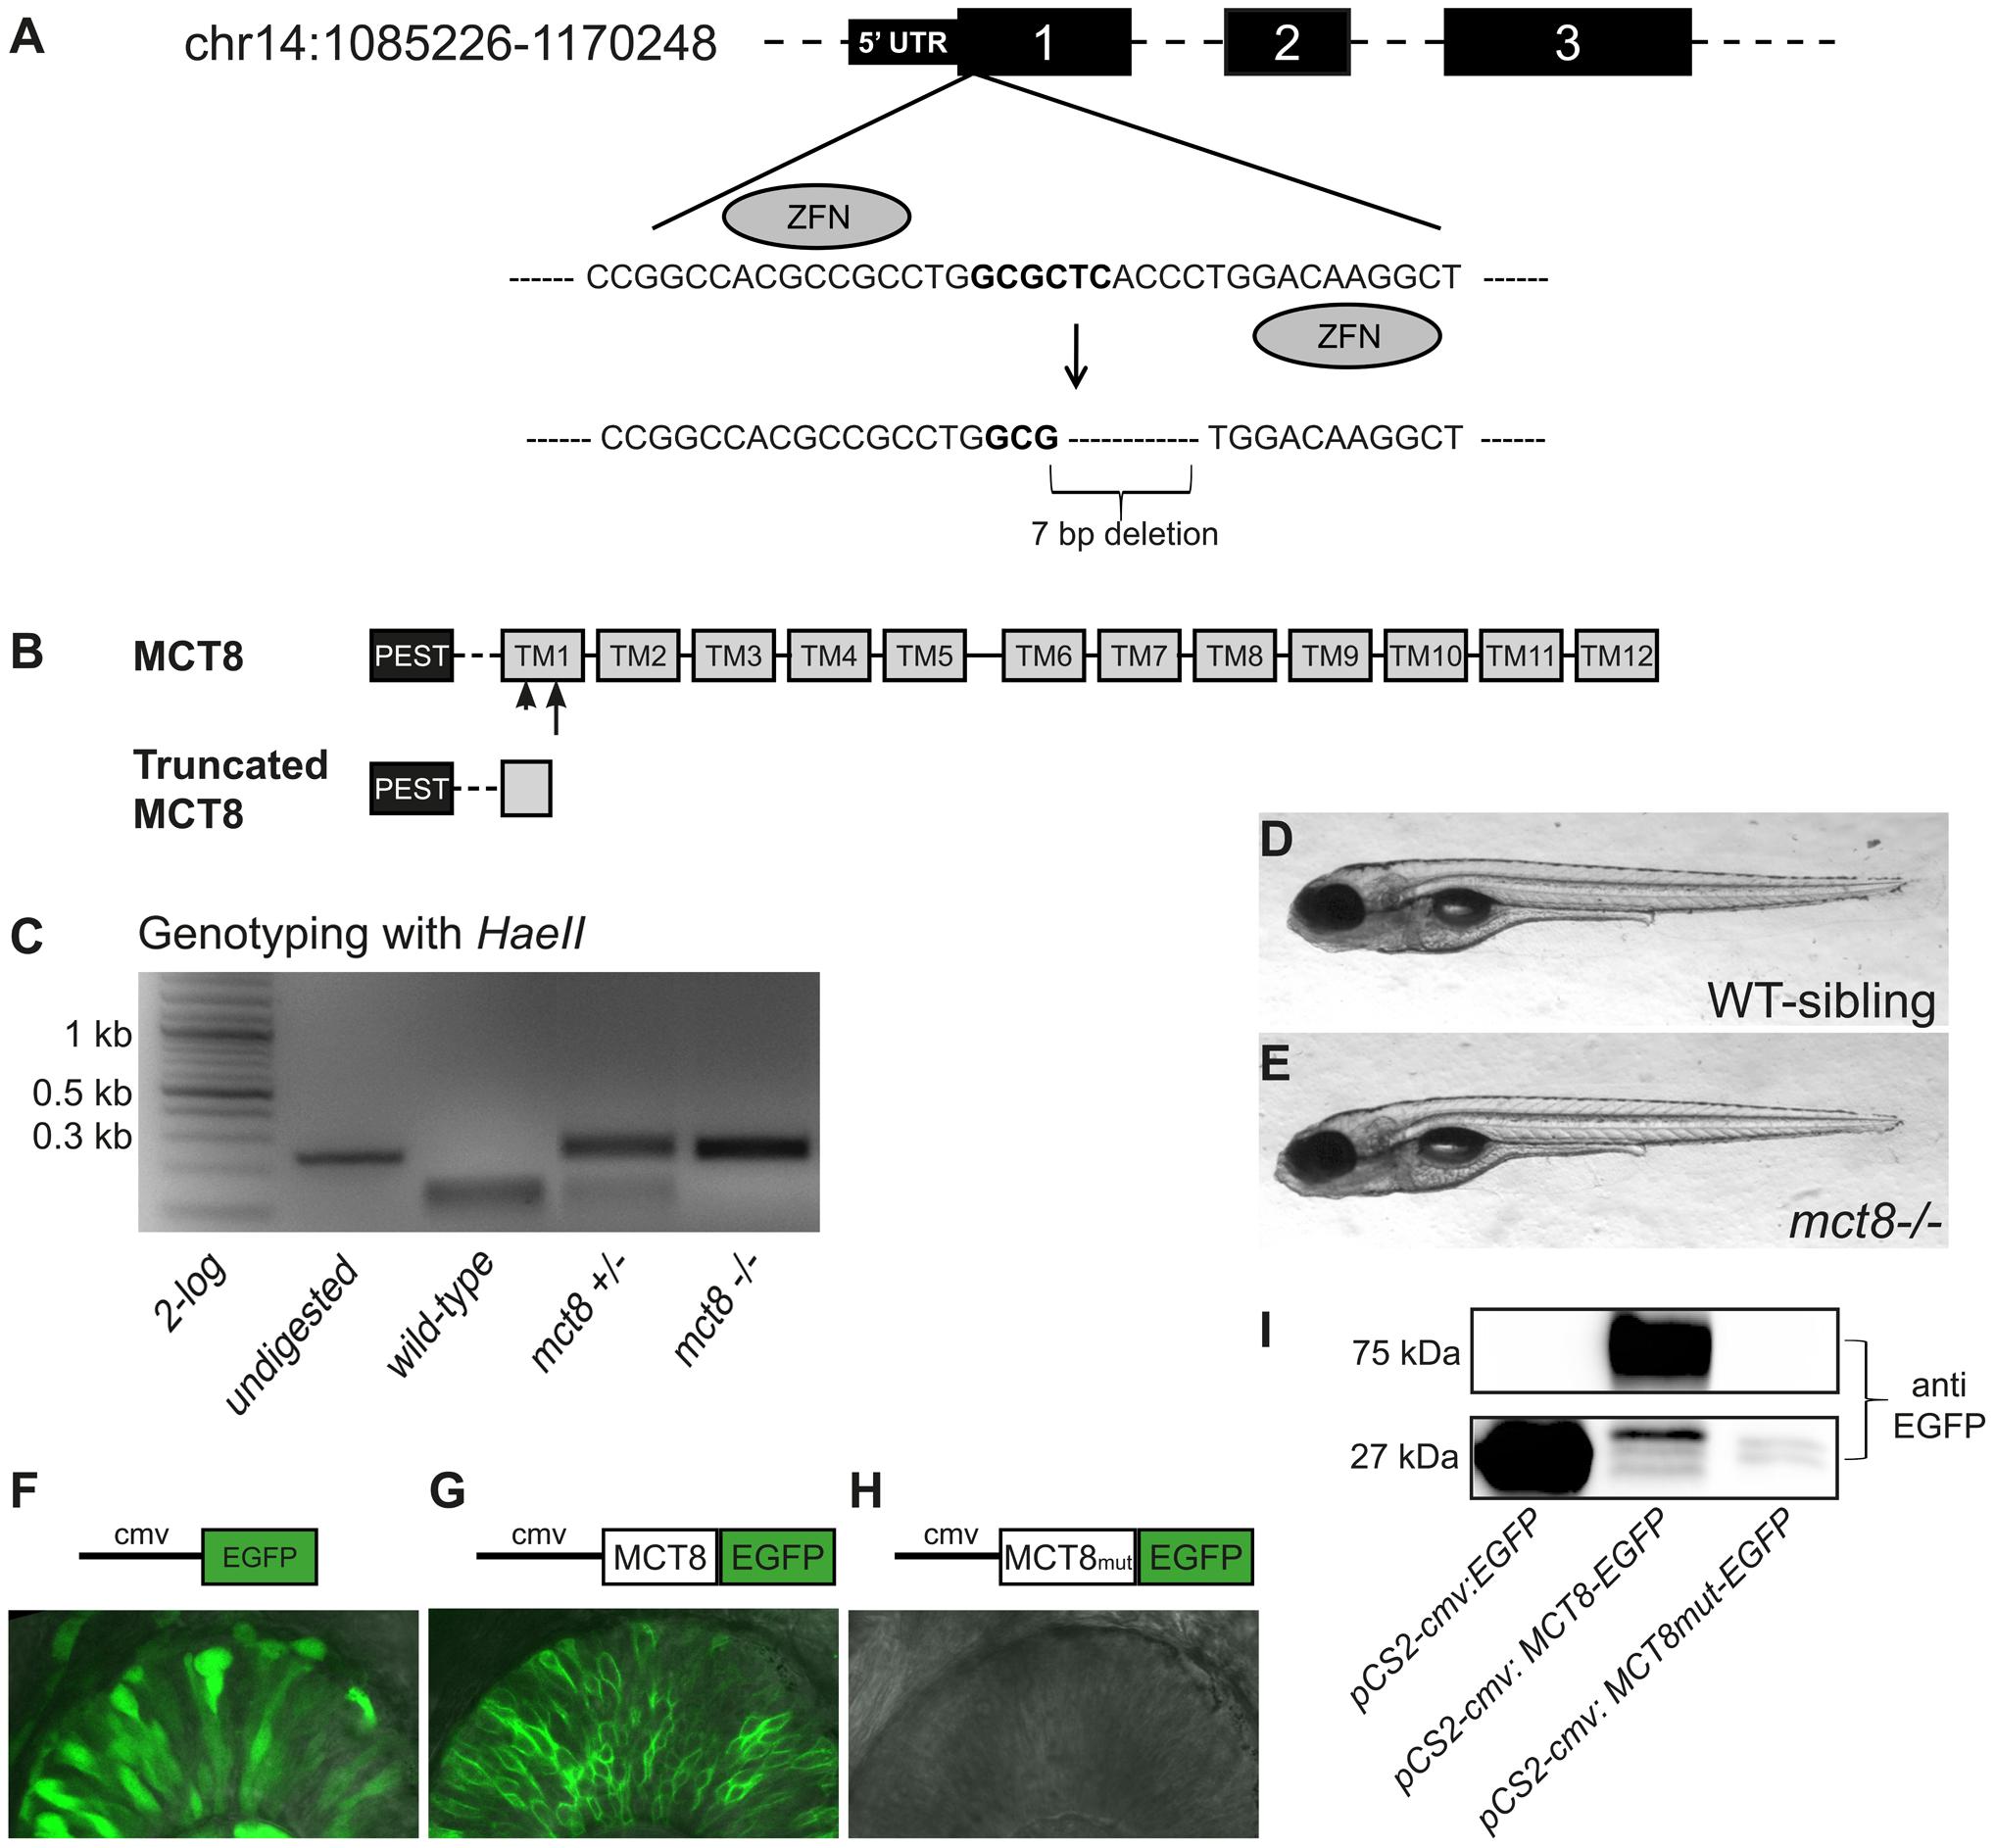 Establishment of ZFN-mediated <i>mct8</i> zebrafish mutant.